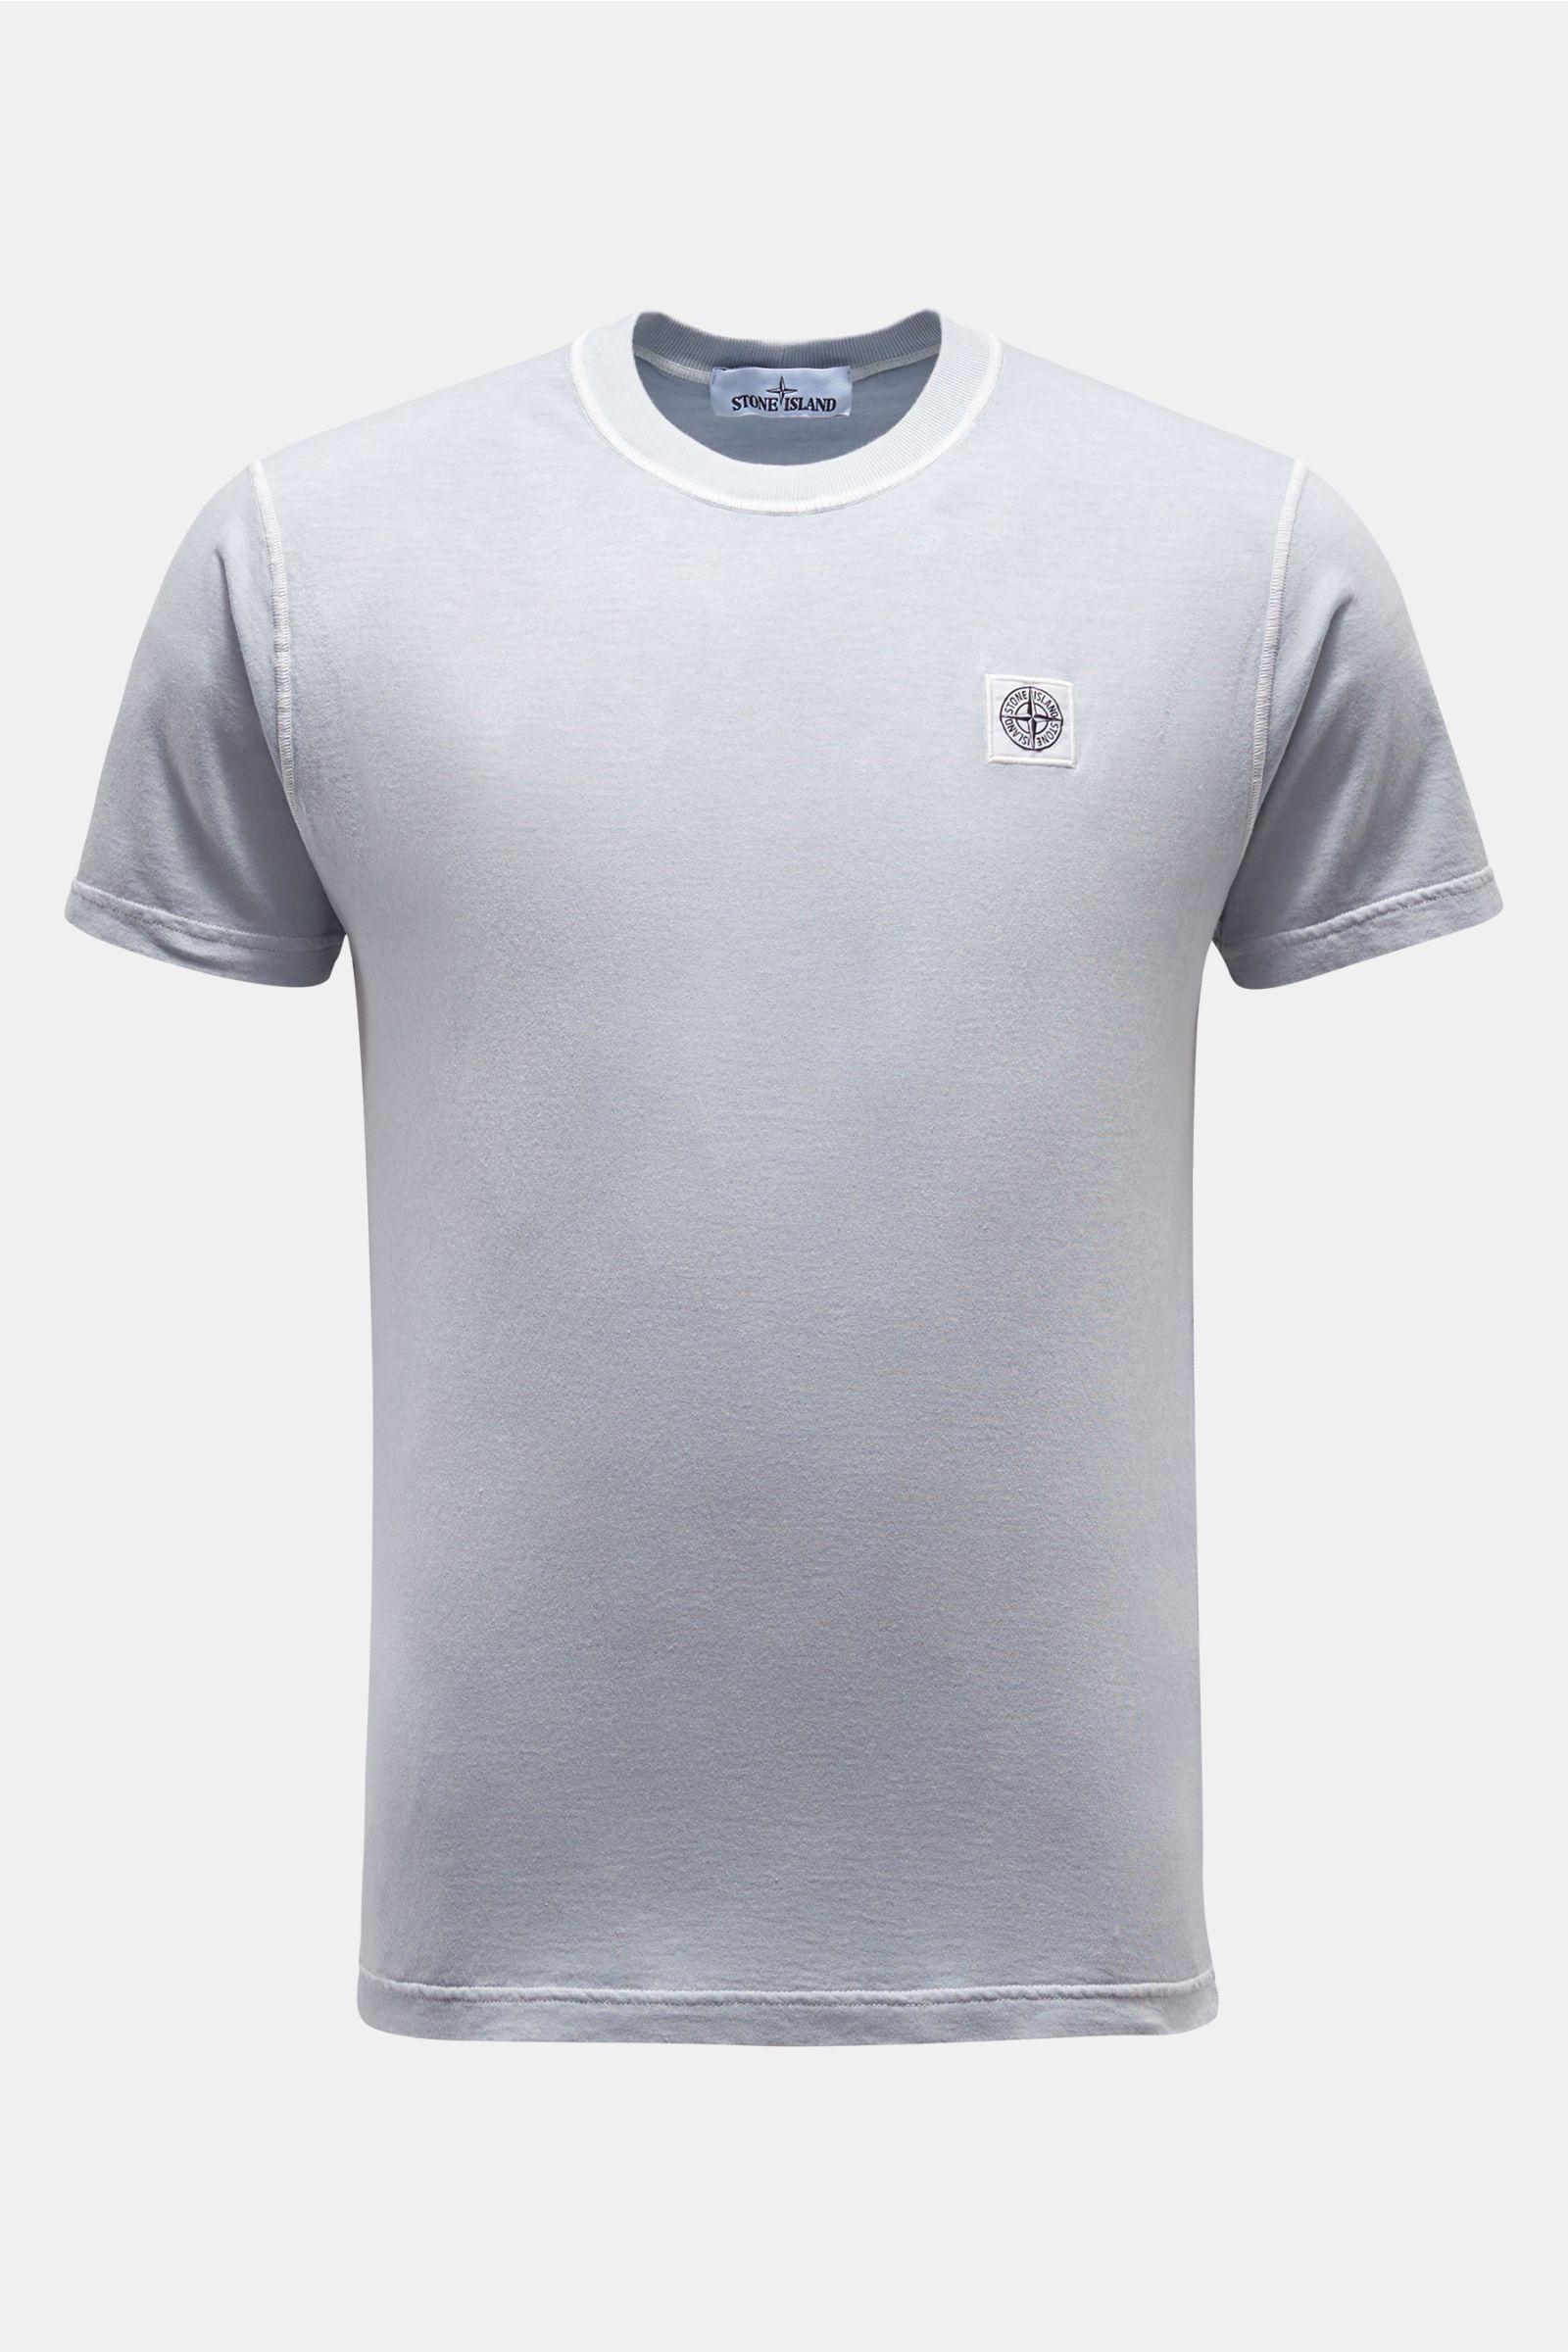 Crew neck T-shirt light grey